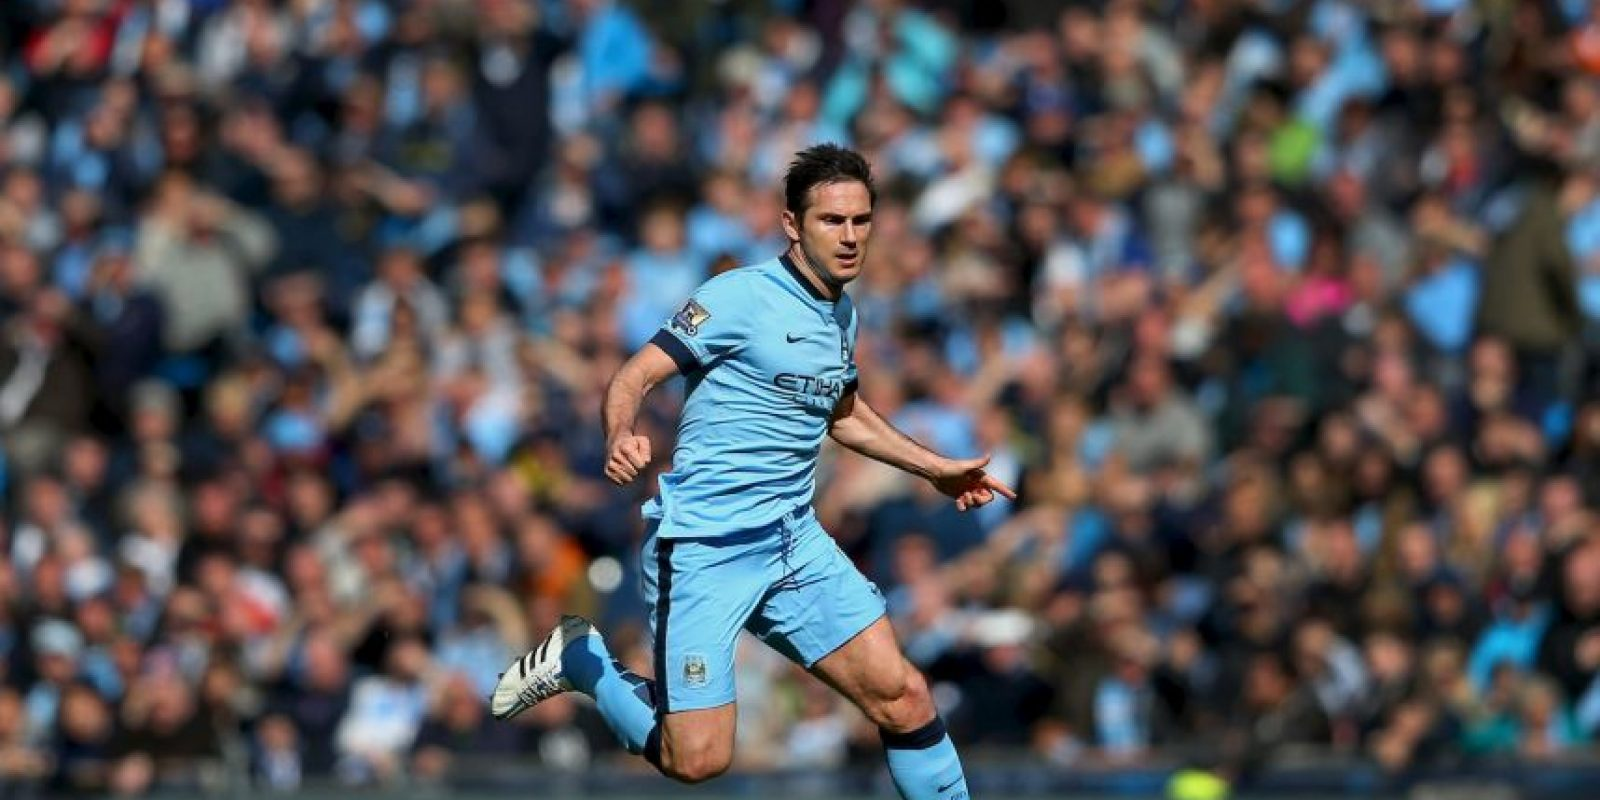 Ha ganado tres Premier League Foto:Getty Images